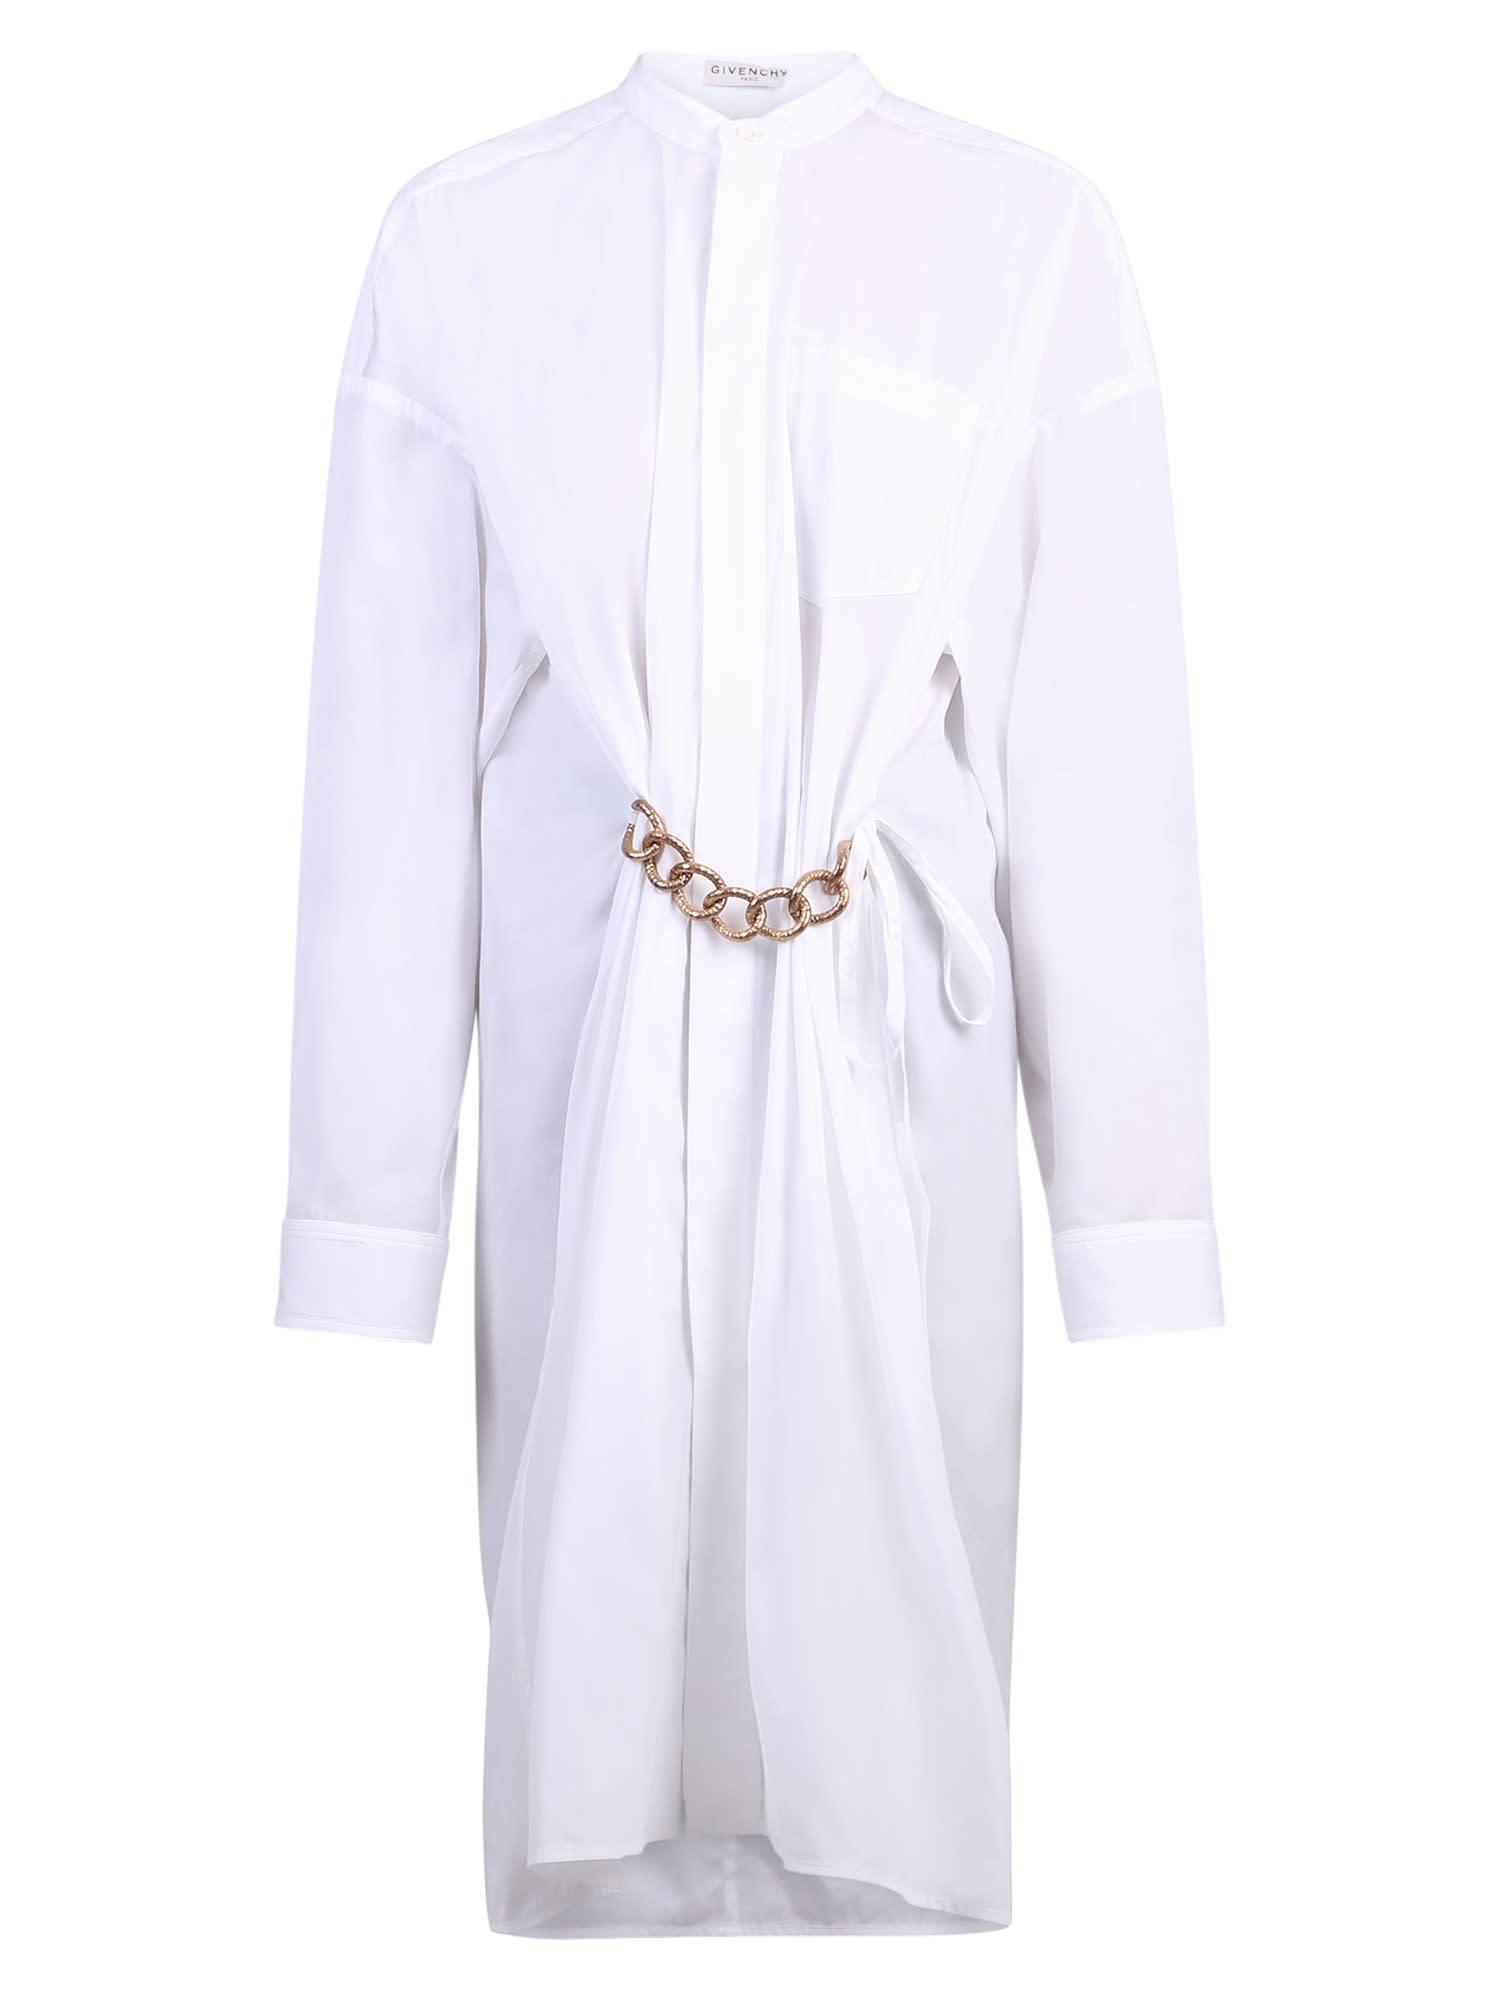 Givenchy SHIRT DRESS